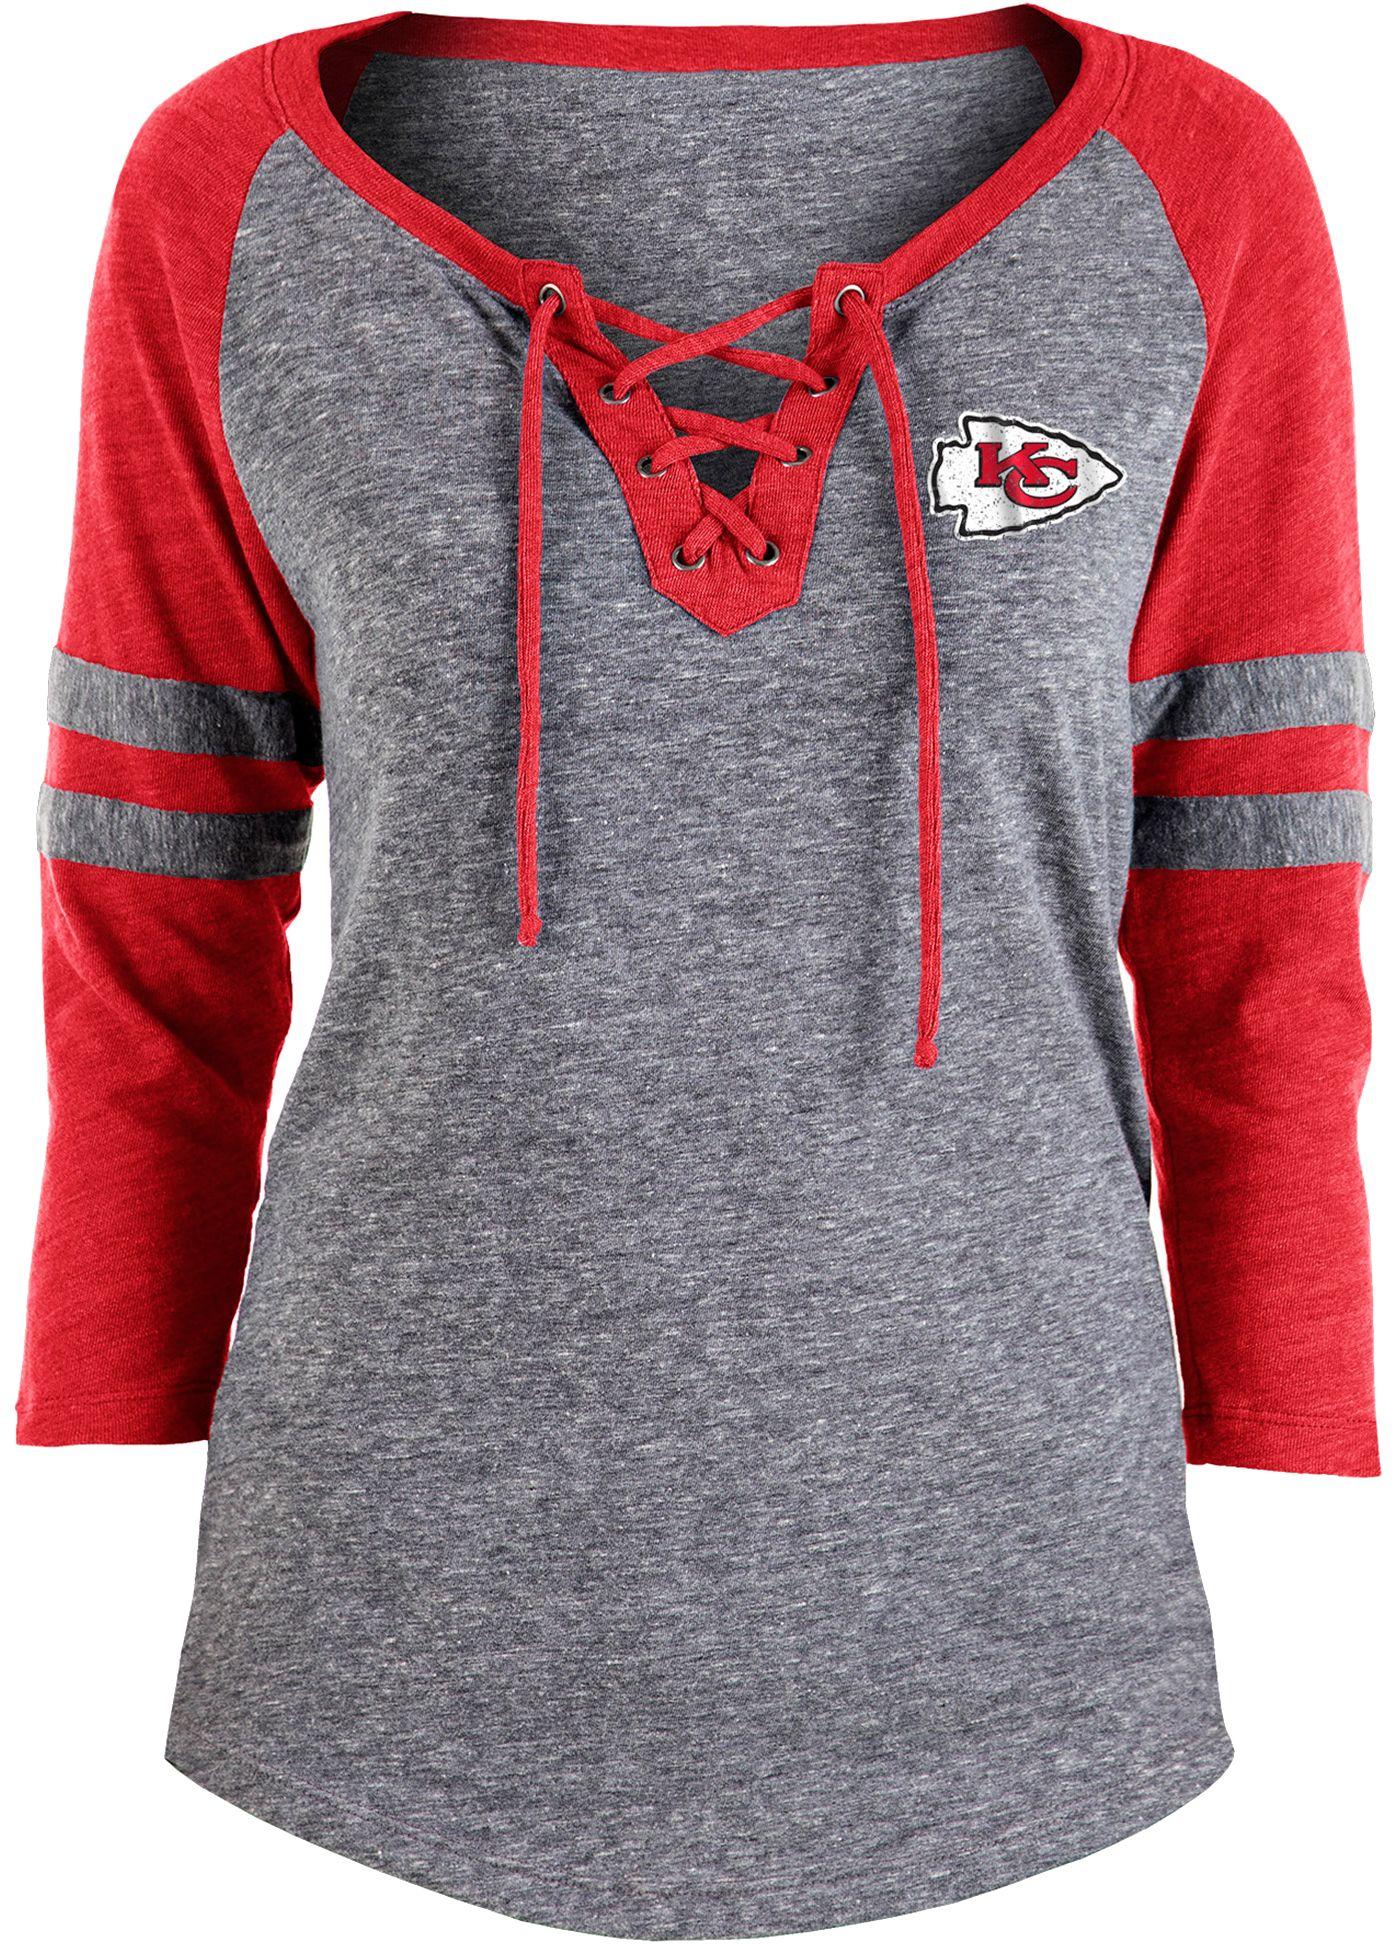 NFL Team Apparel Women's Kansas City Chiefs Trilace Grey Raglan Shirt